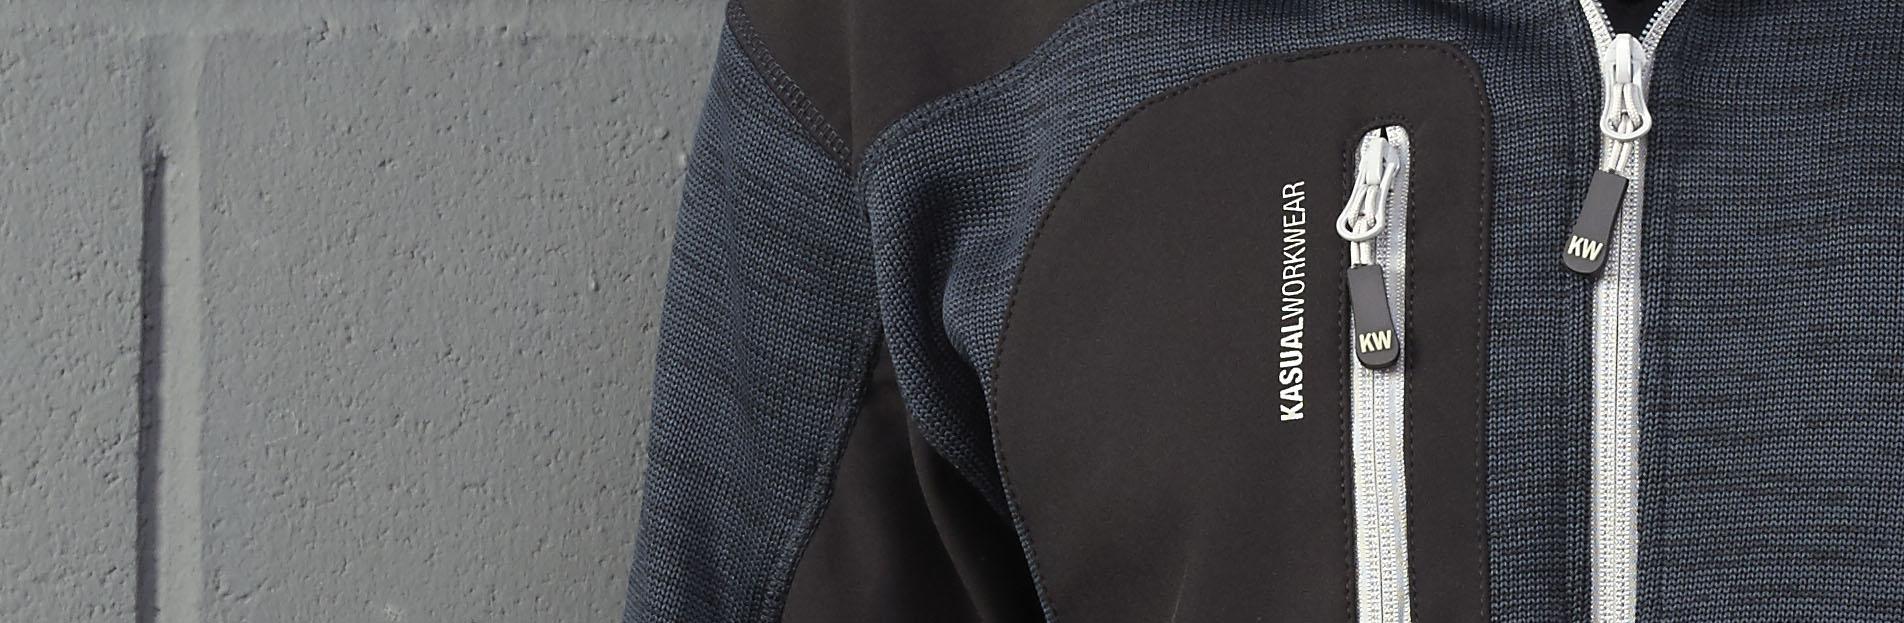 Serie Kasual Workwear